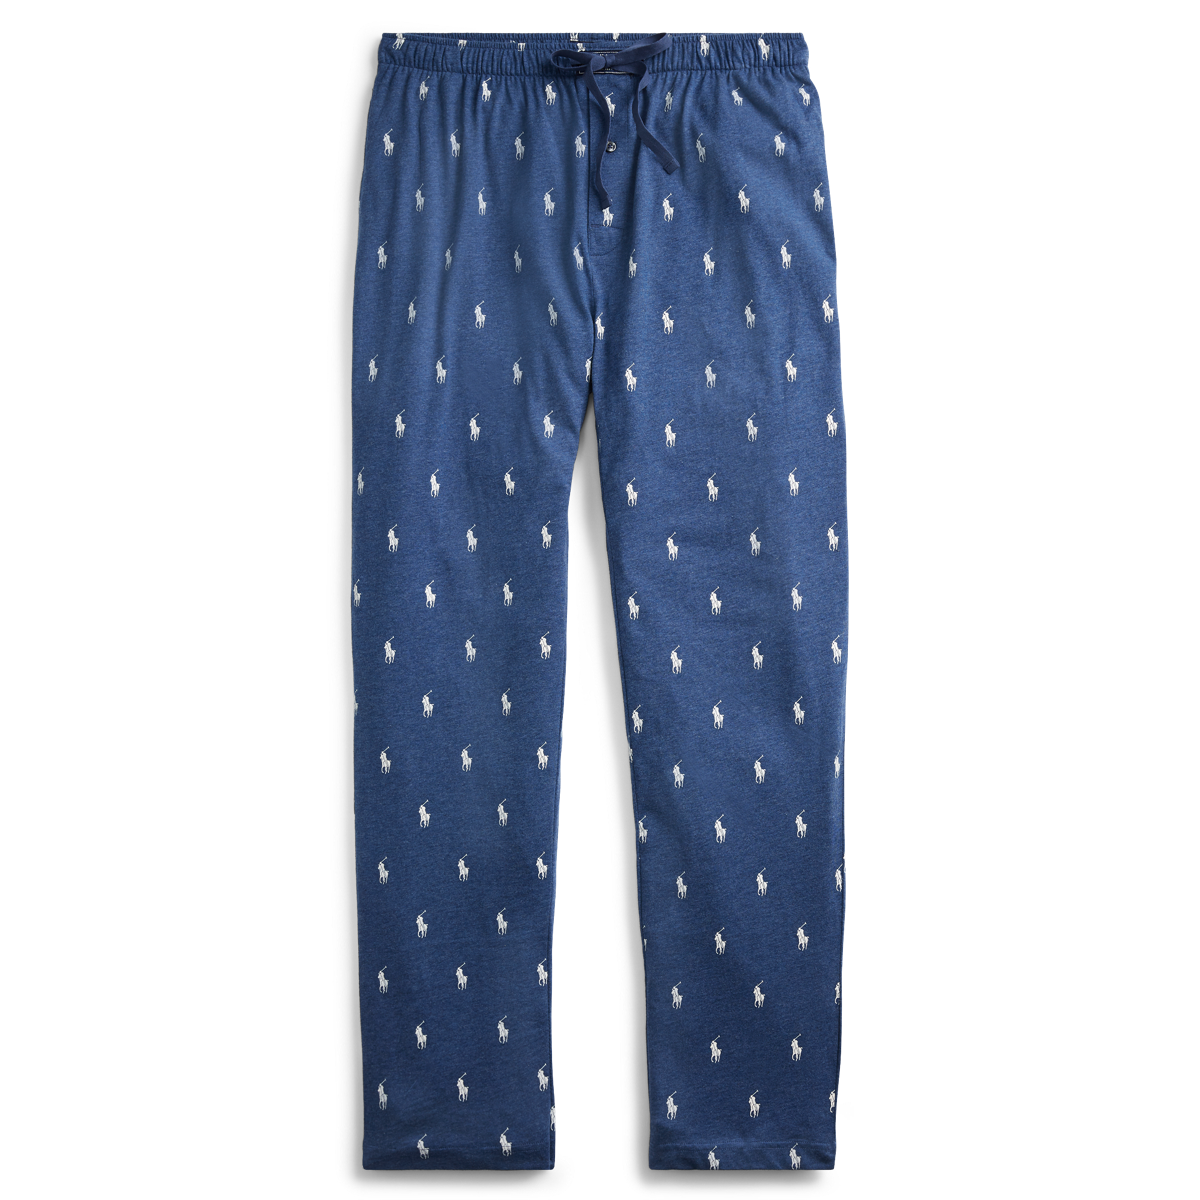 5240fccf02 Pony-Print Pajama Pant